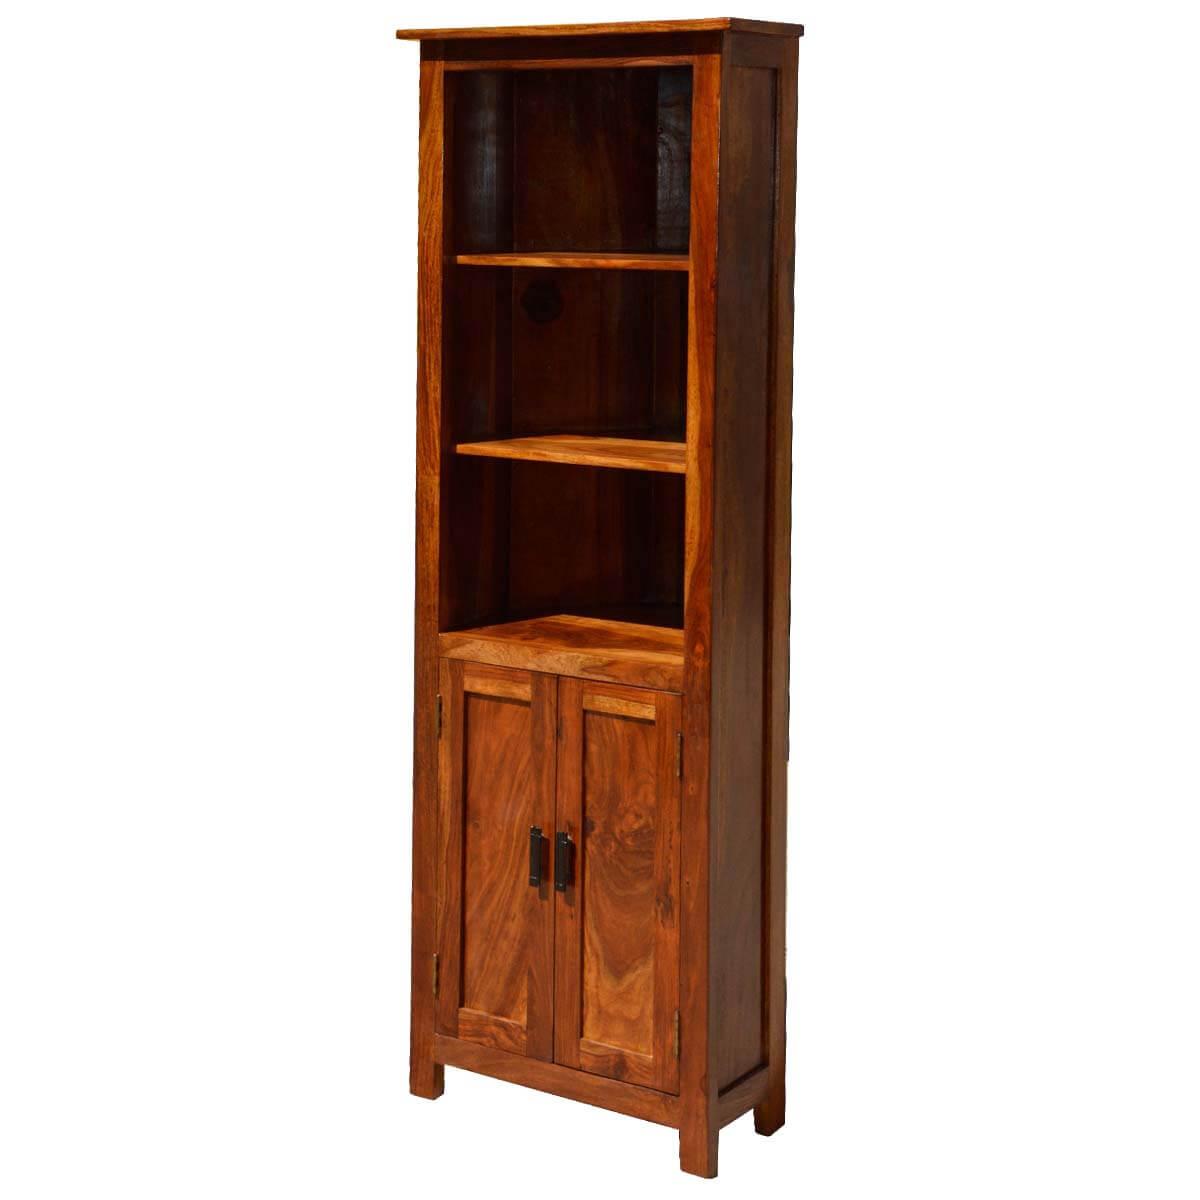 Tulare 3 Open Shelf Rustic Solid Wood Corner Bookcase With Doors